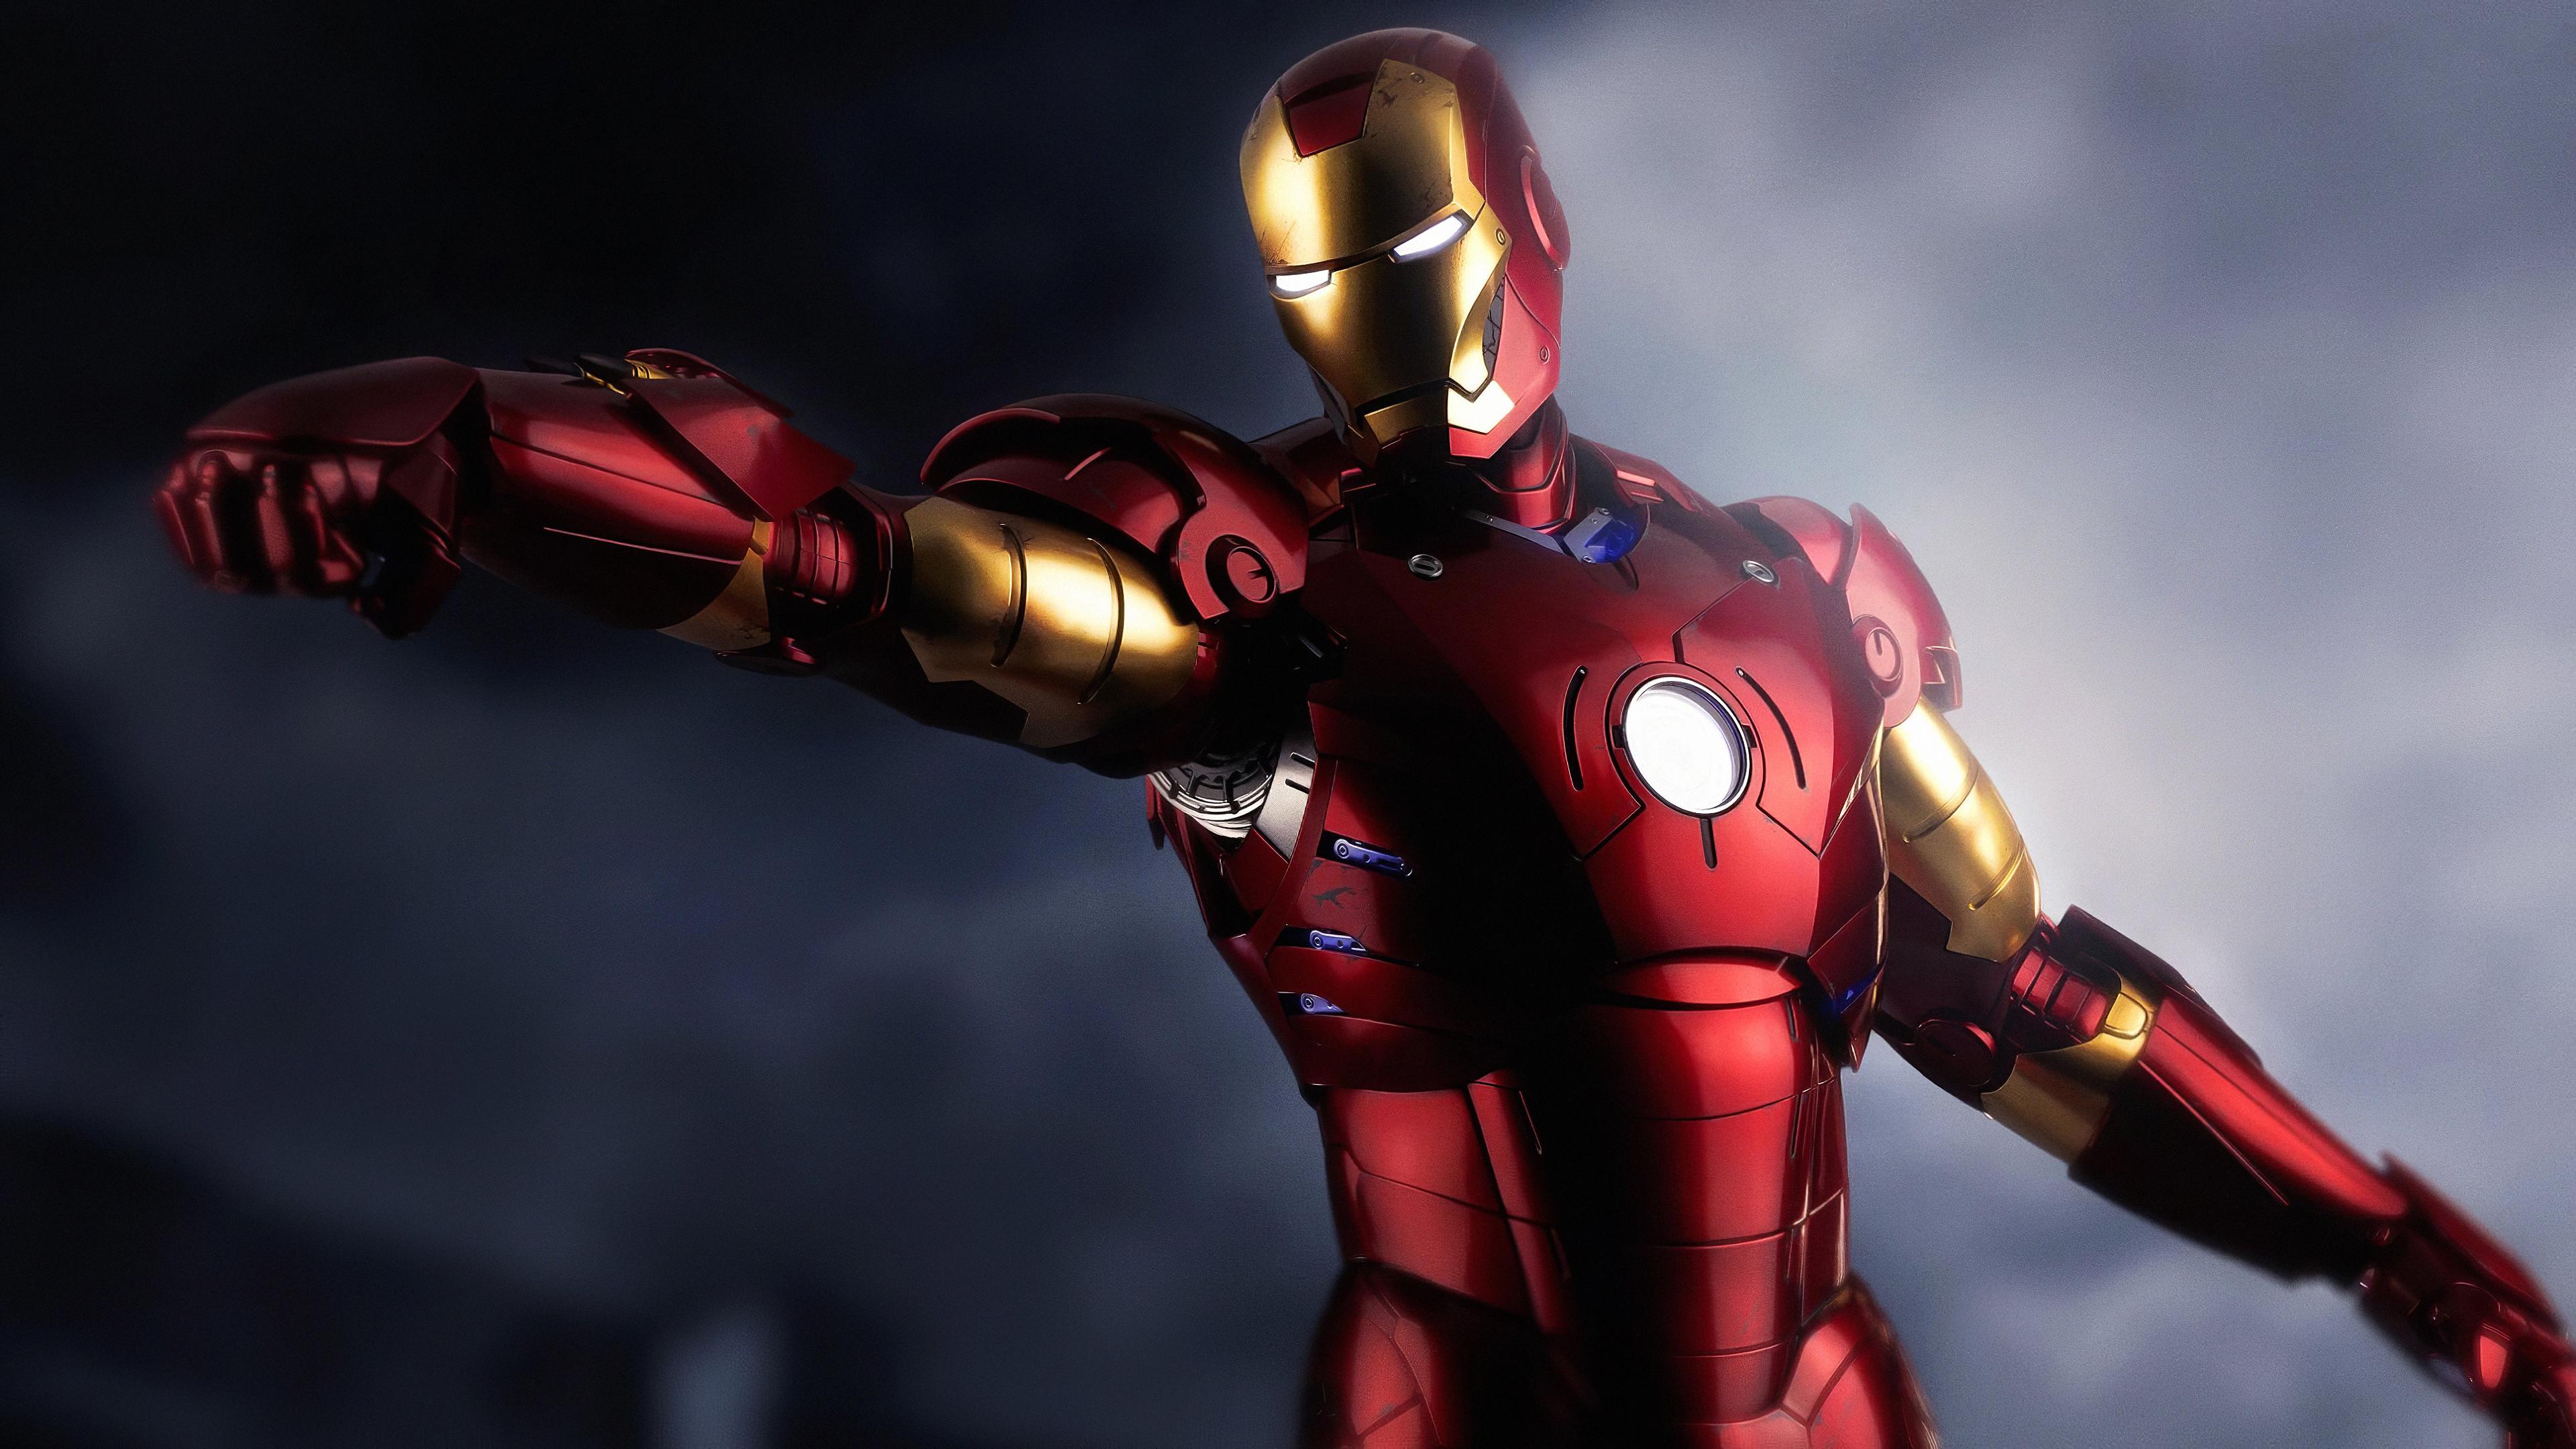 iron man art 1576092658 - Iron Man Art - iron man wallpaper phone hd 4k, iron man wallpaper 4k, iron man 4k hd wallpaper